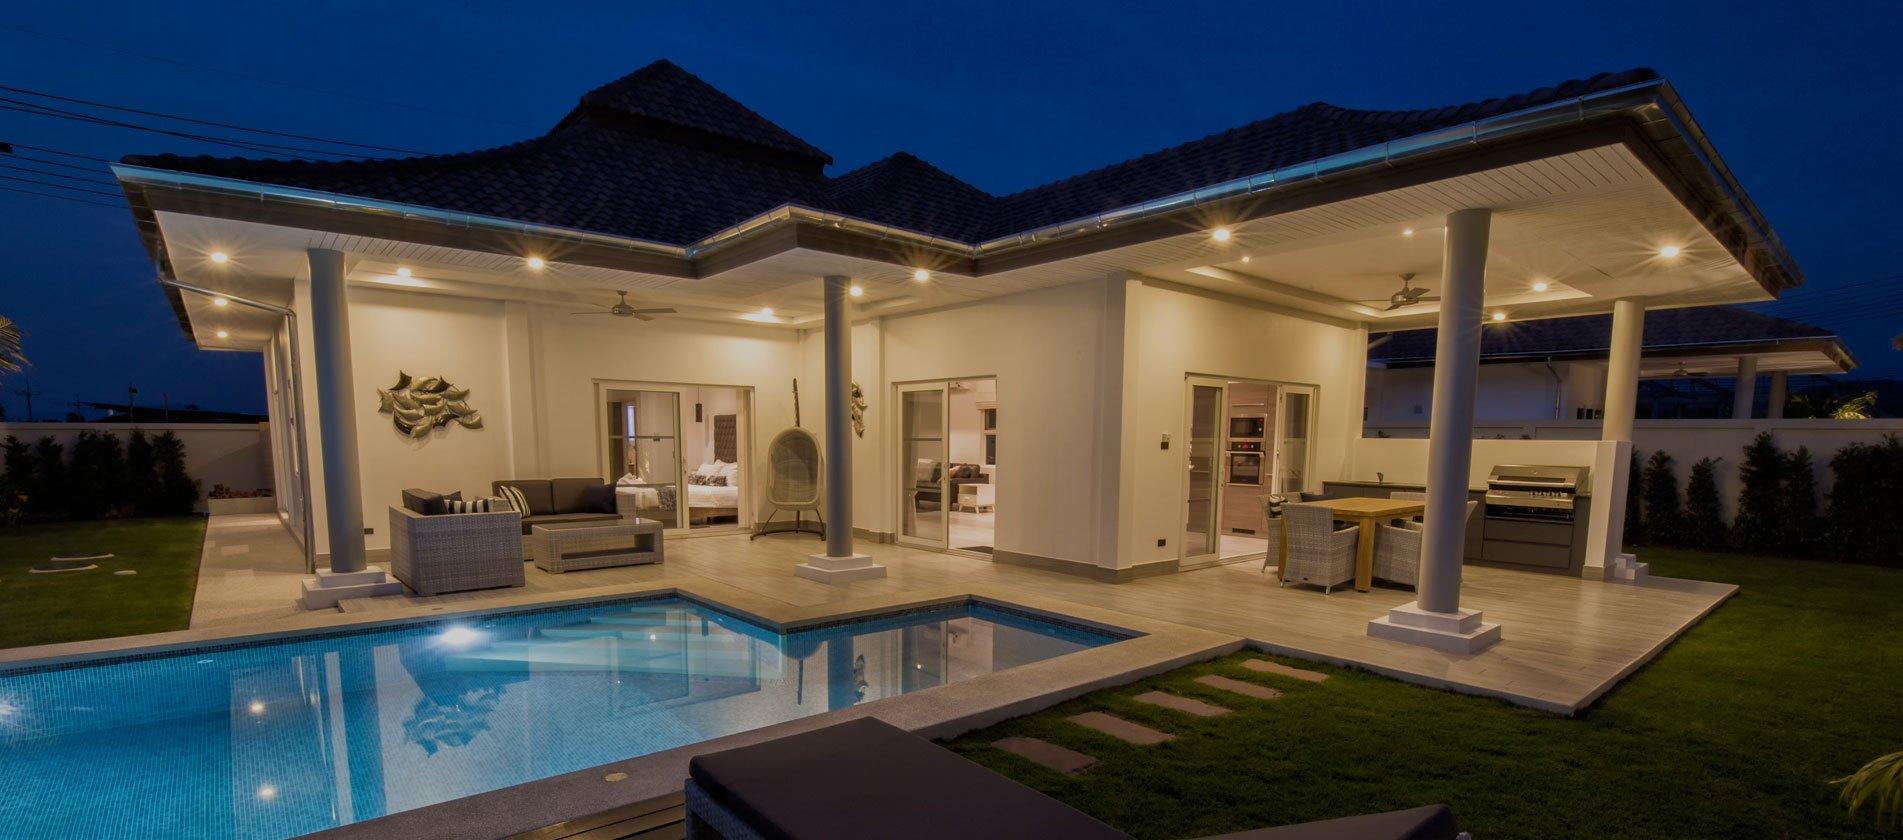 Luxury Villas In Hua Hin | Orchid Palm Homes. Luxury Pool Villas